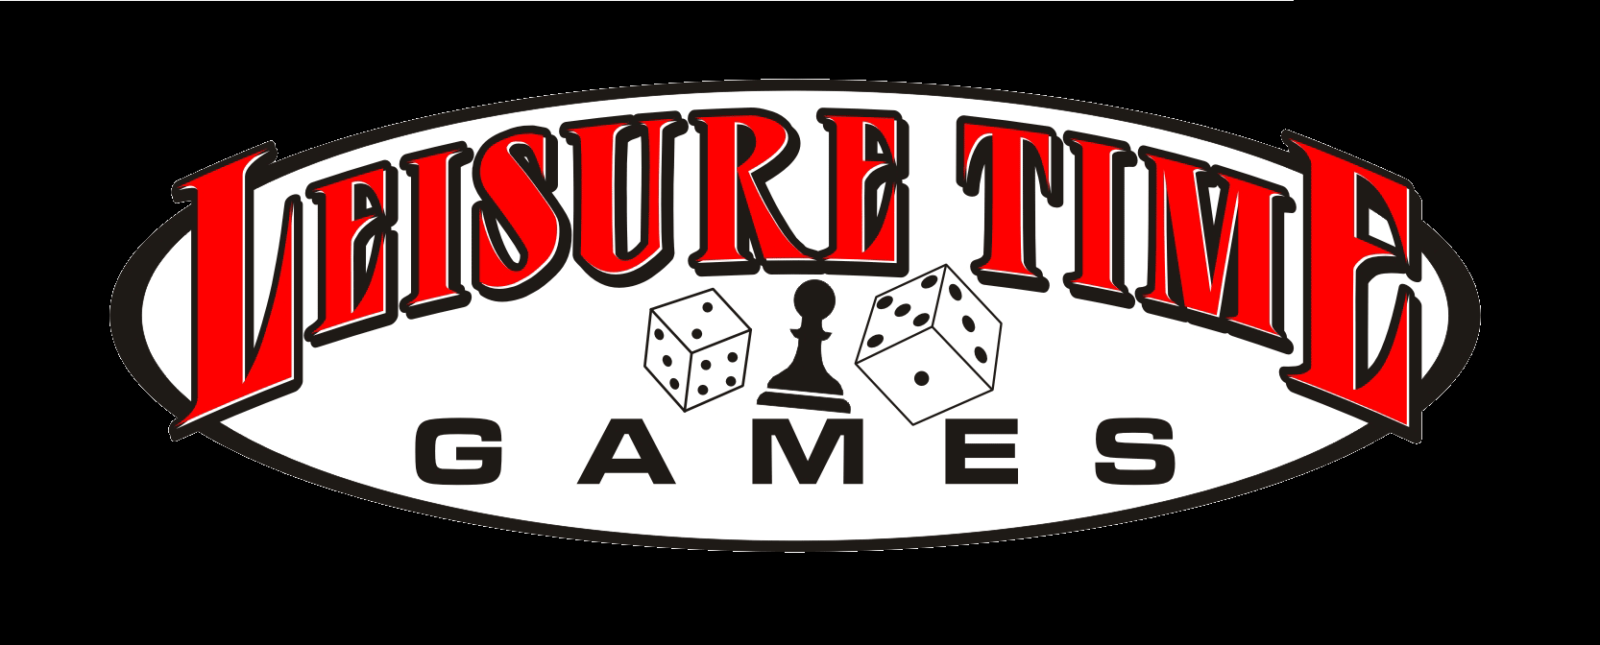 http://www.leisuretimegames.com/wp-content/uploads/2017/10/cropped-LTG_Logo_1515x625.png